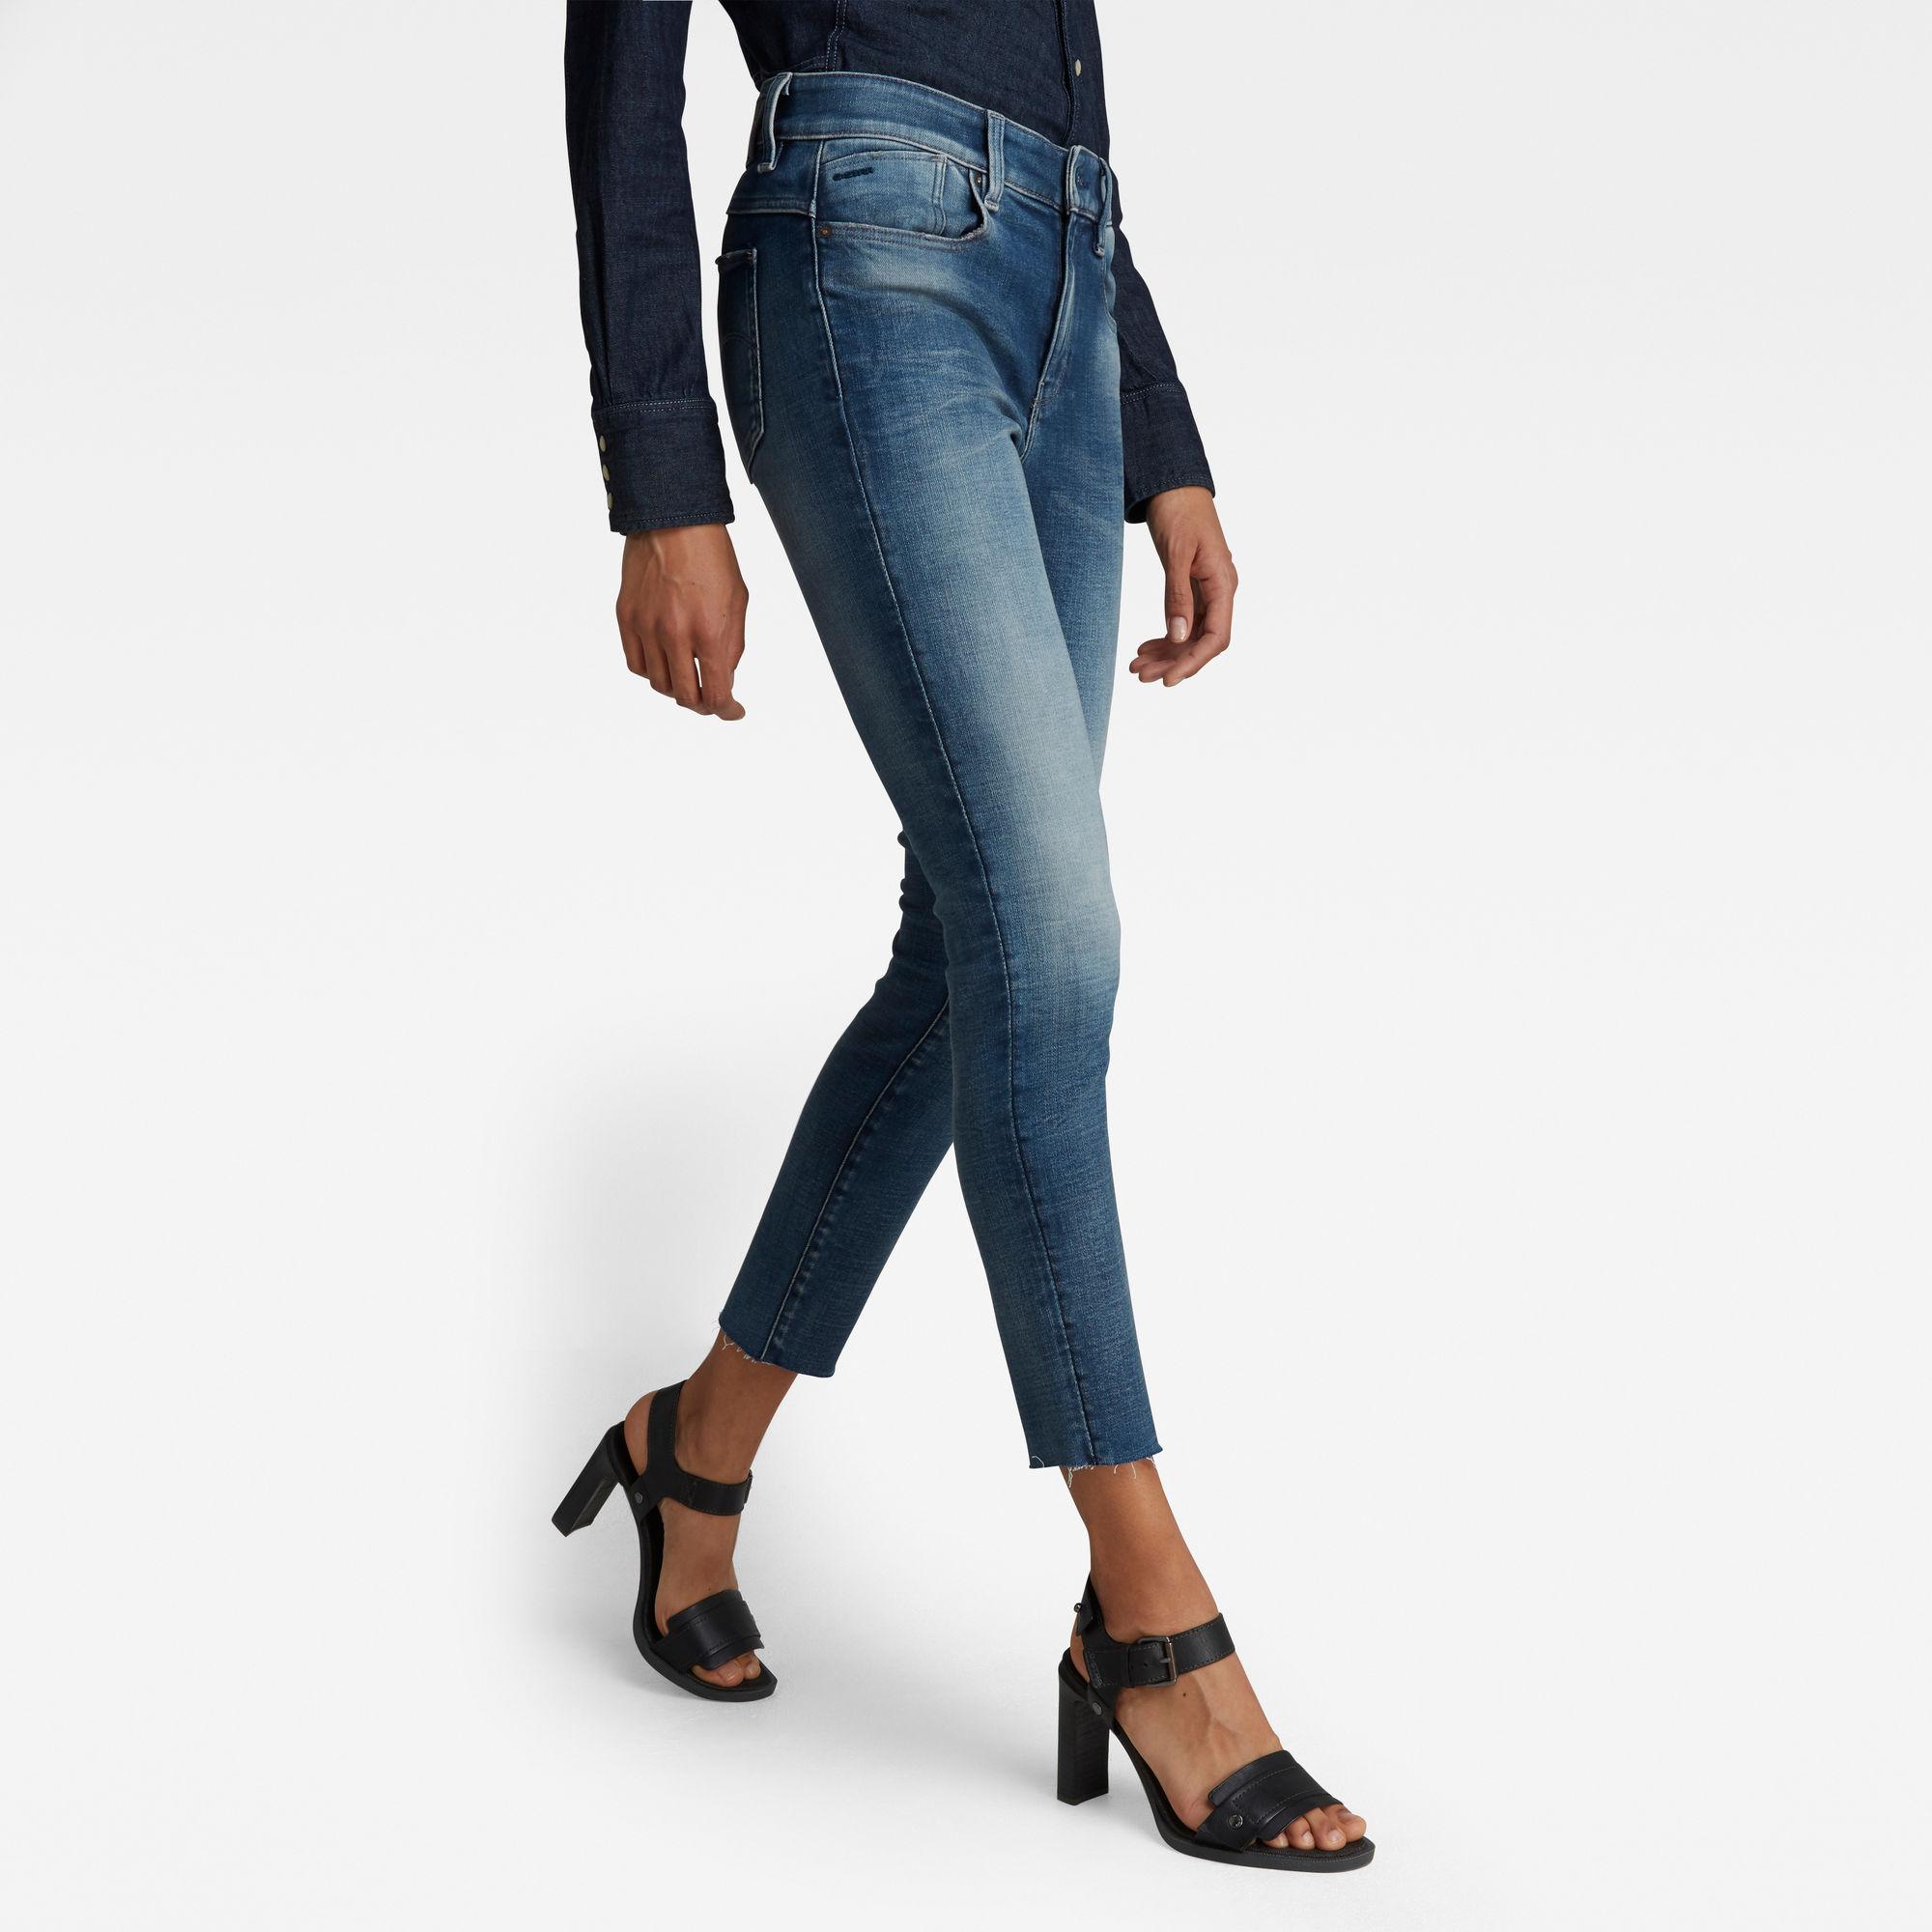 G-Star RAW Dames Lhana Skinny Ankle Jeans Blauw